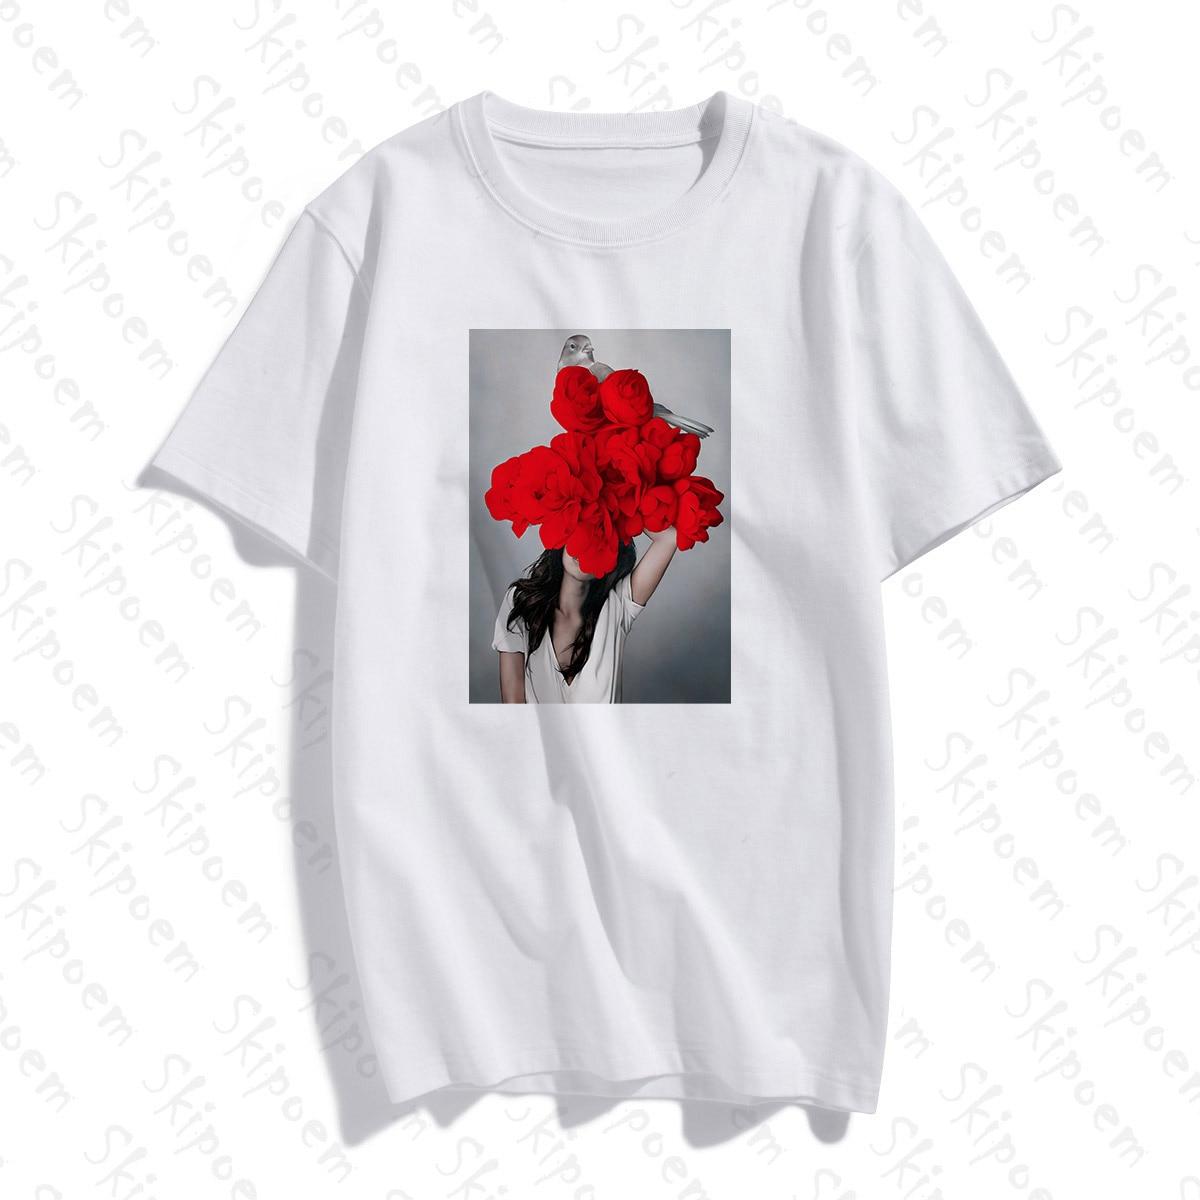 Nordic Sexy Art Woman With Flowers Tshirt Women Gothic Tumblr Kawaii Punk Plus Size Cotton Short Sleeve T Shirt Femme Streetwear